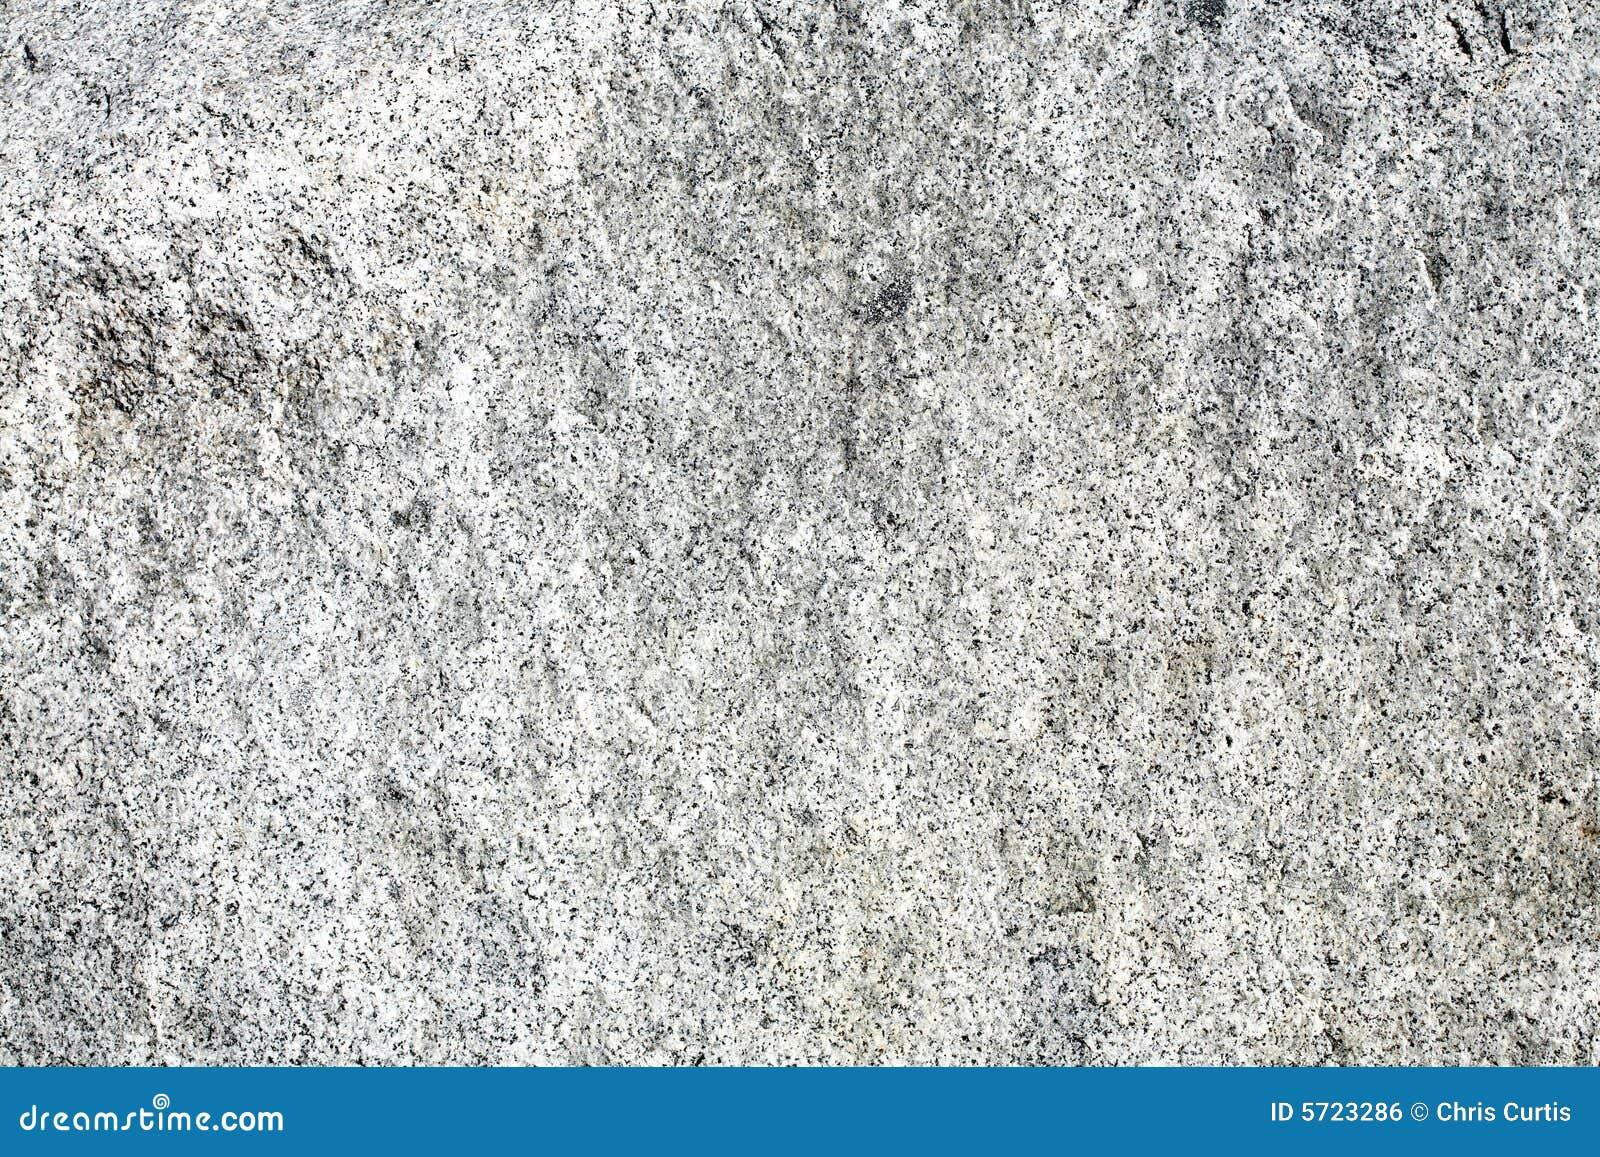 Rough Granite Stone : Rough granite stone surface royalty free stock image